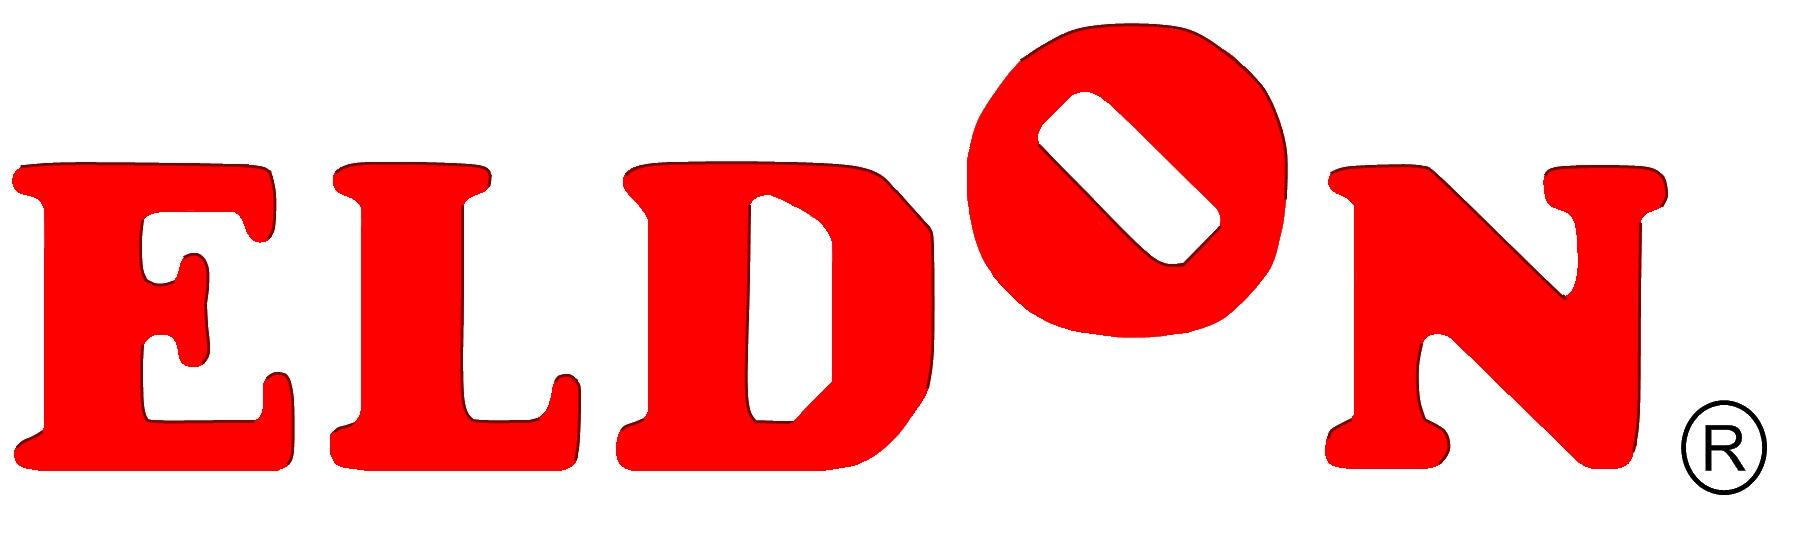 eldon-logo